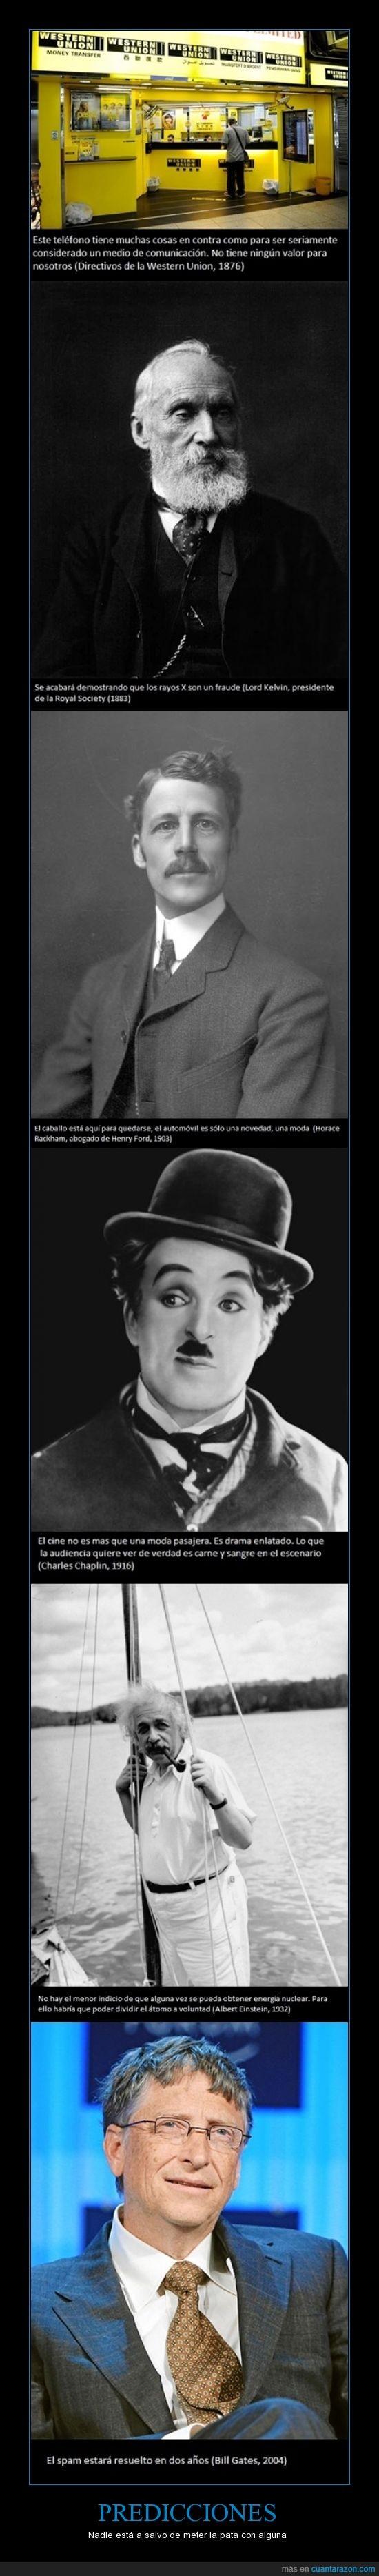 Albert Einstein,Bill Gates,Charles Chaplin,cine,coche,fail,fallo,Henry Ford,Horacke Rackham,Lord Kelvin,nuclear,predicciones,rayos X,spam,teléfono,vaticinios,visionarios,Western Union